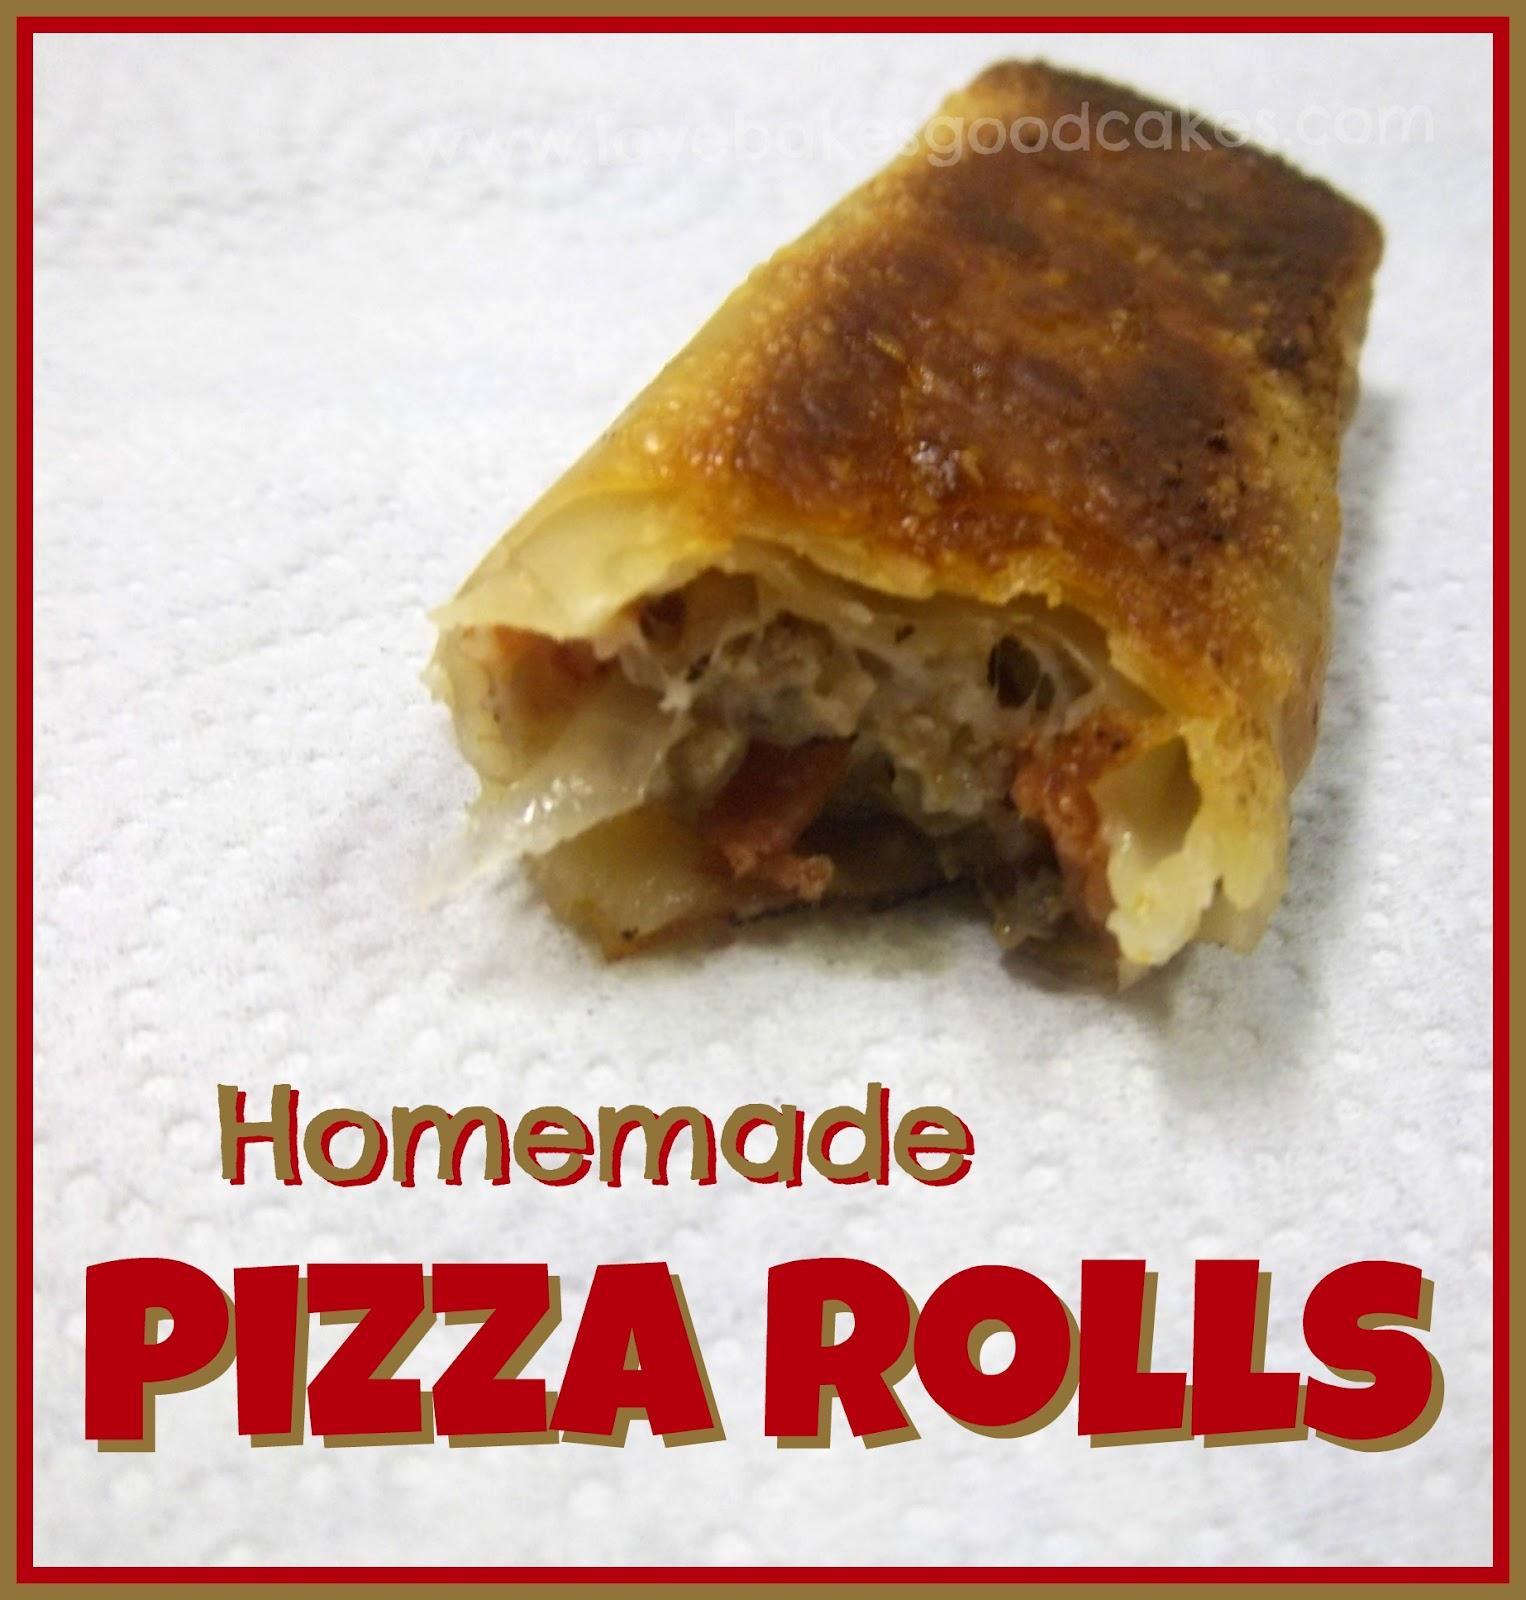 Homemade Pizza Rolls | Love Bakes Good Cakes